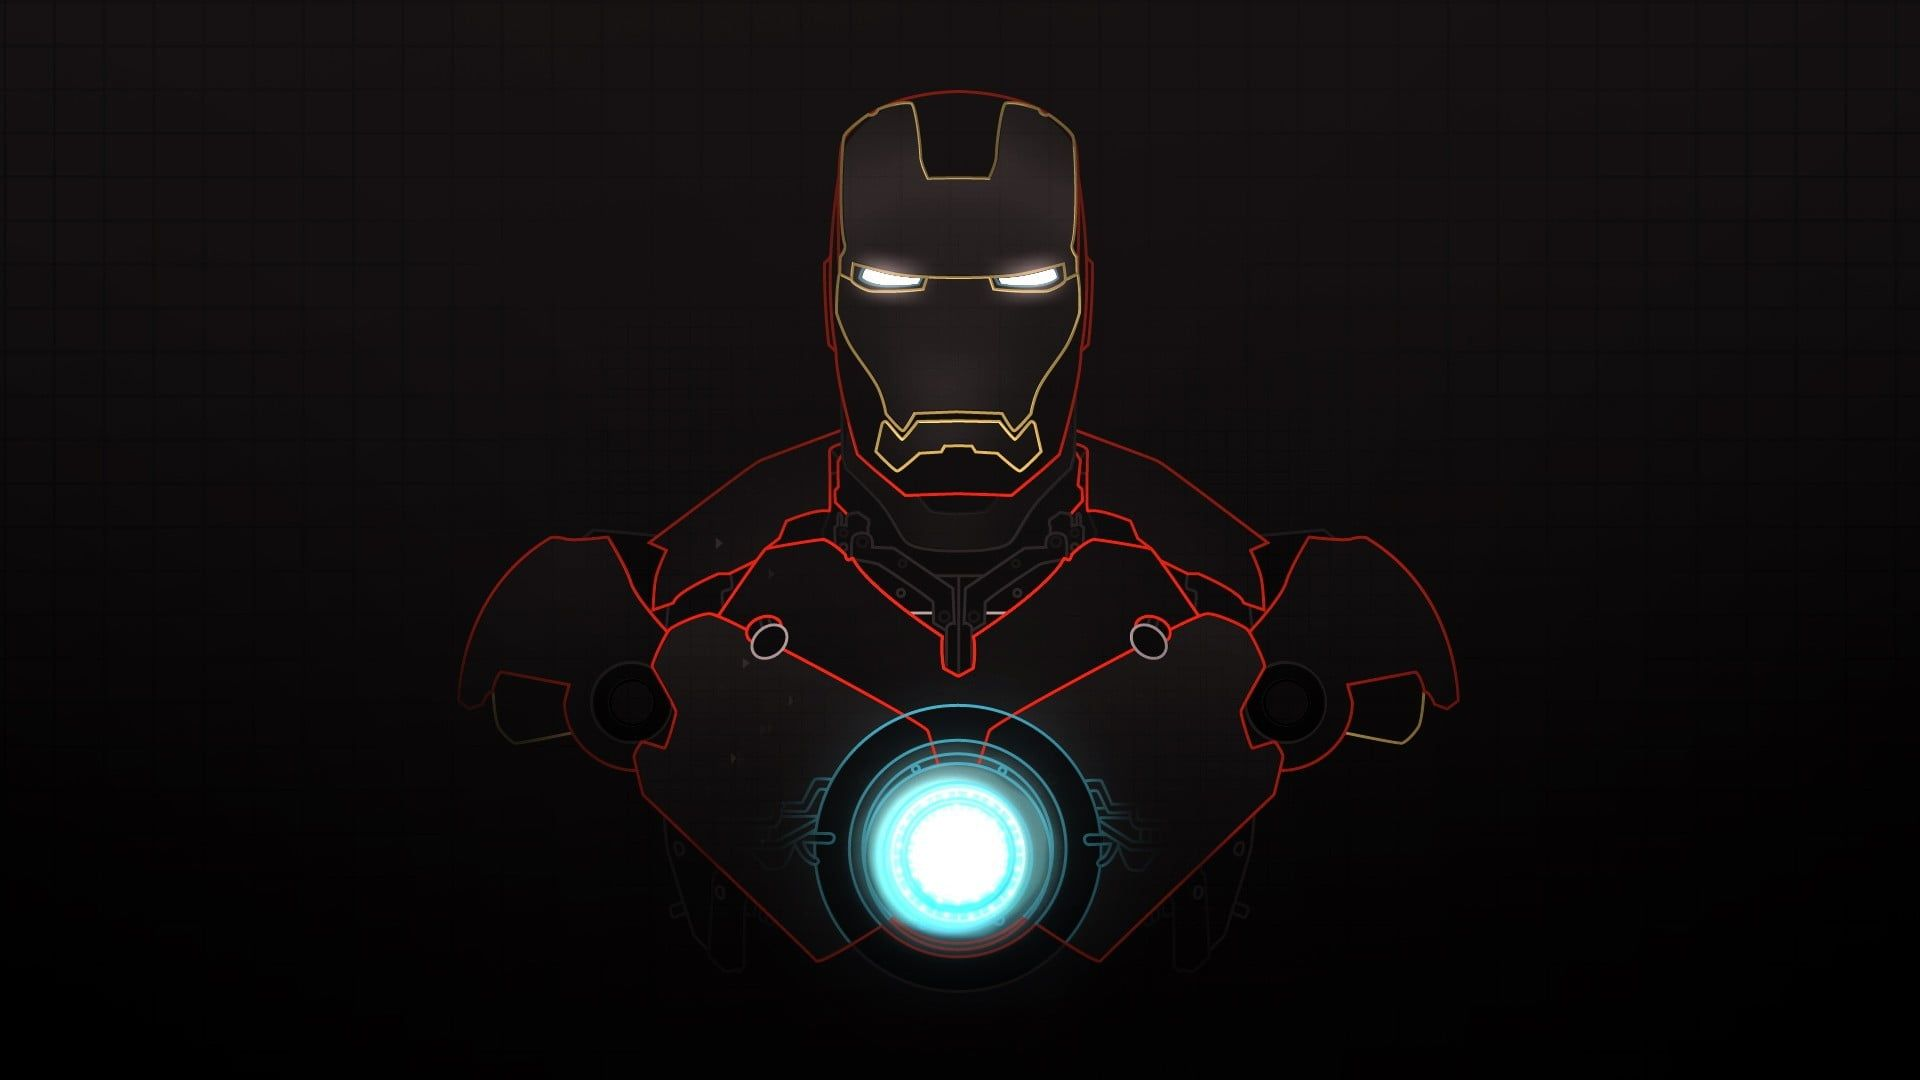 Marvel Iron Man Digital Wallpaper Iron Man Dark Background Superhero Grid Glowing Cyan Red Black Ba Iron Man Hd Wallpaper Iron Man Wallpaper Man Wallpaper